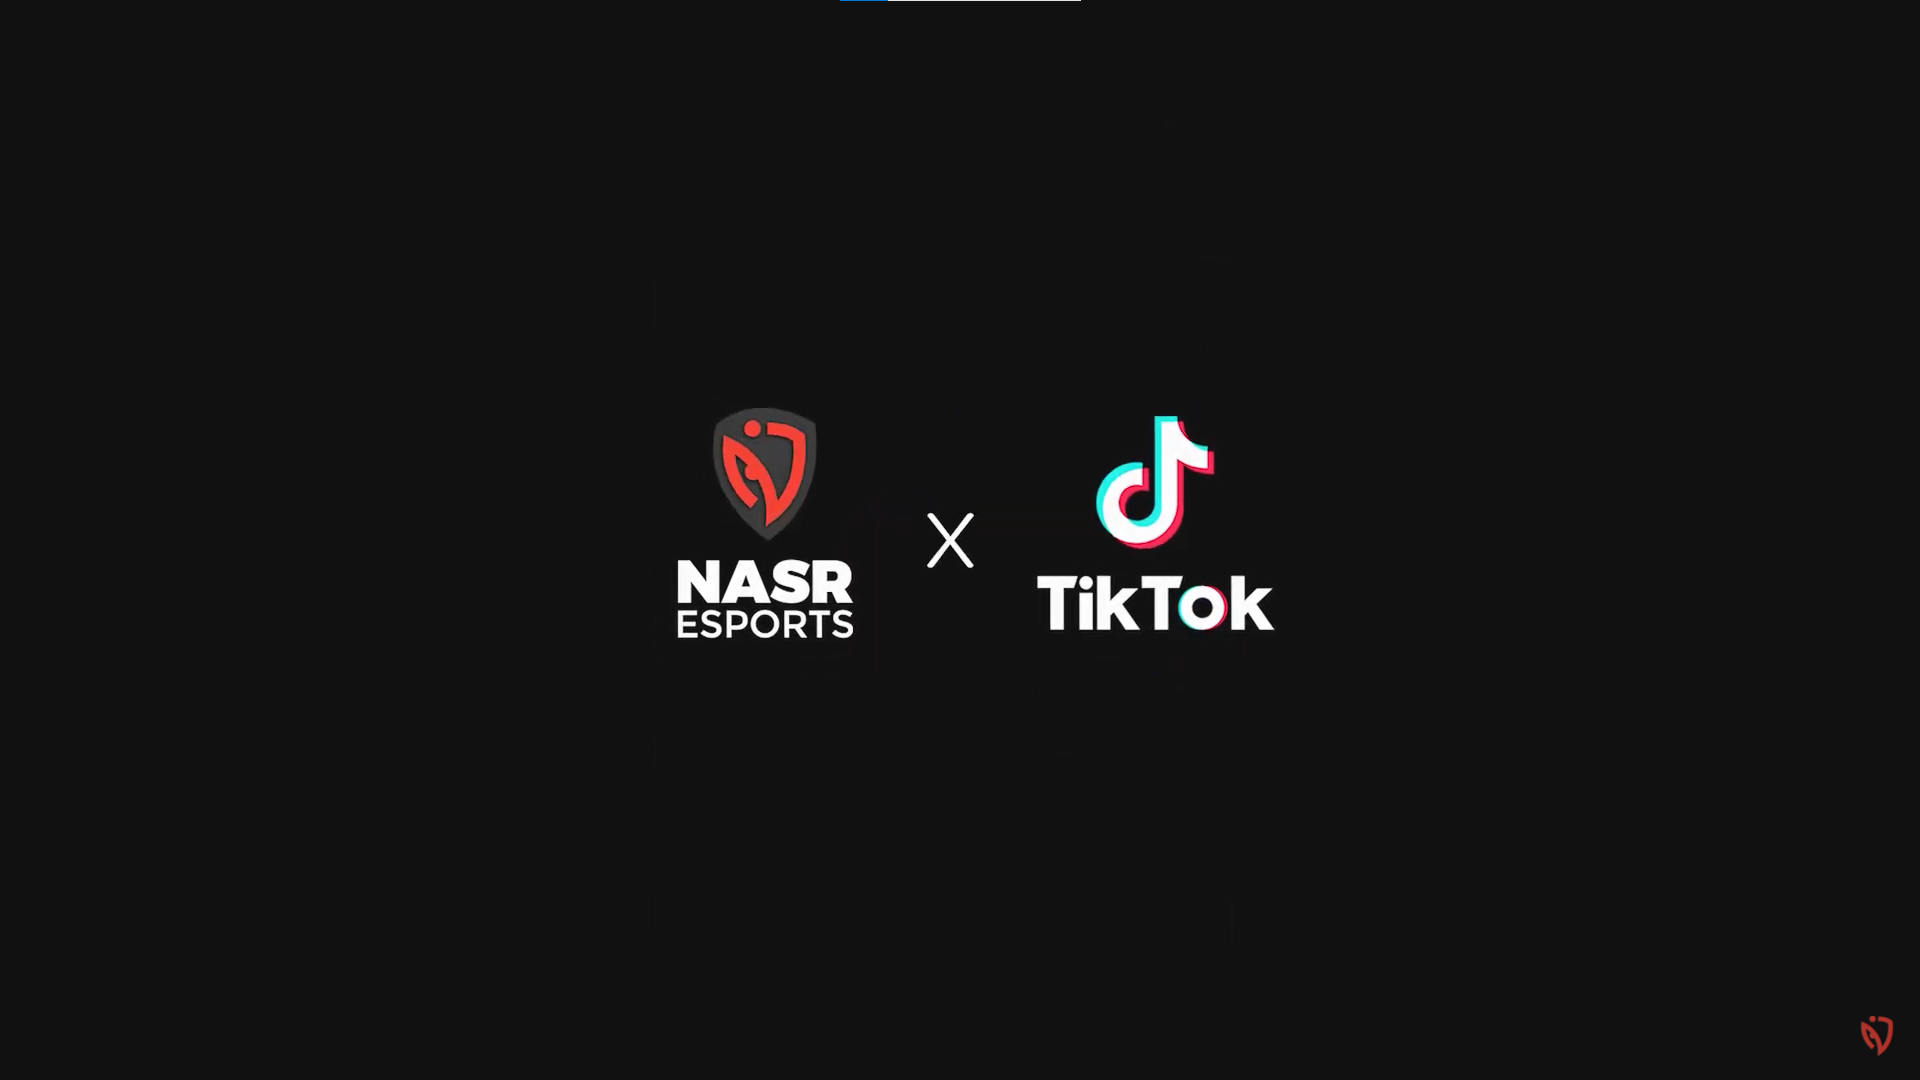 NASR Esports x TikTok